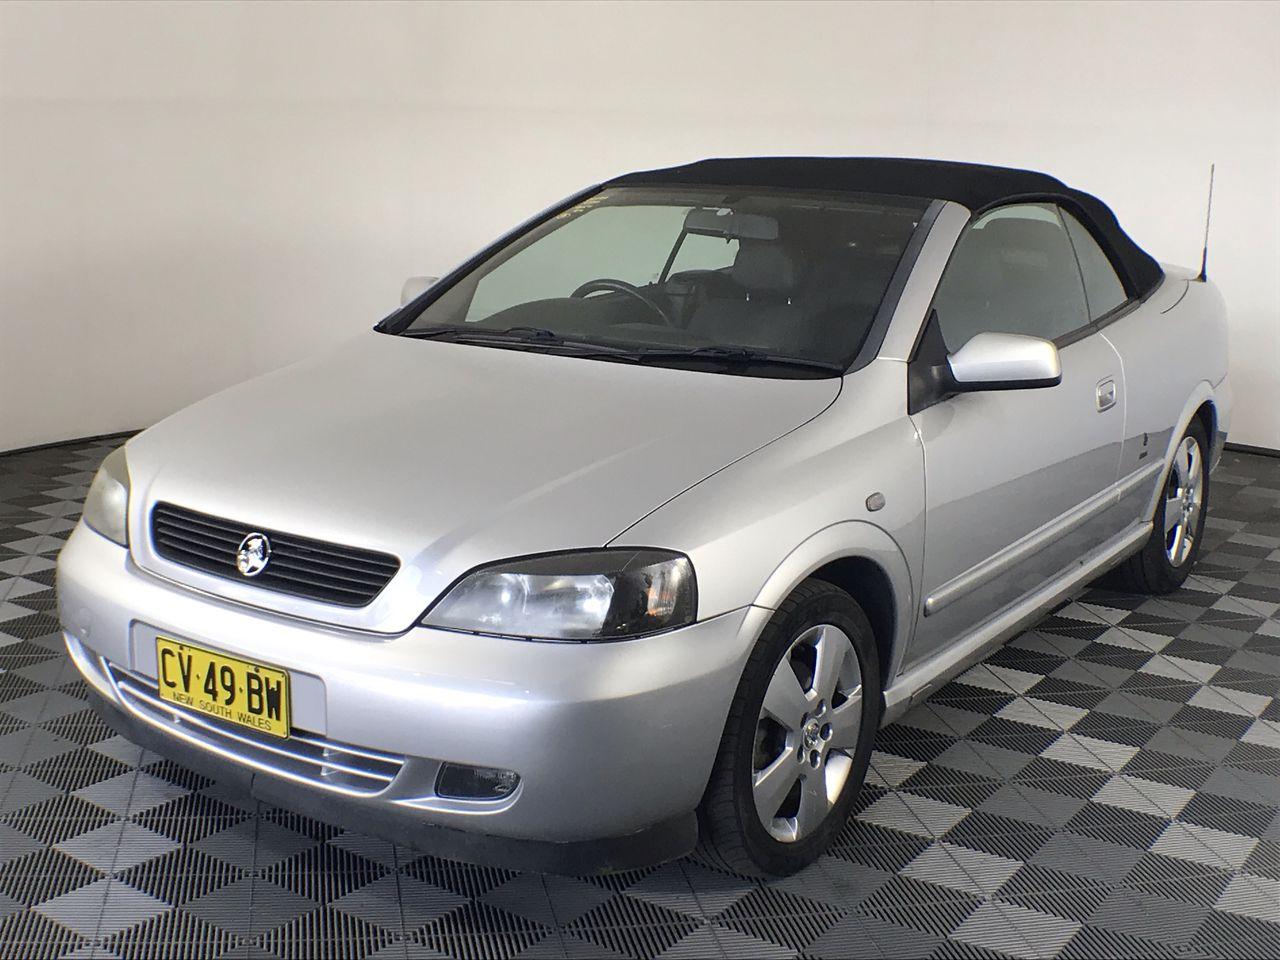 2005 Holden Astra Convertible Bertone Edition TS Automatic Convertible